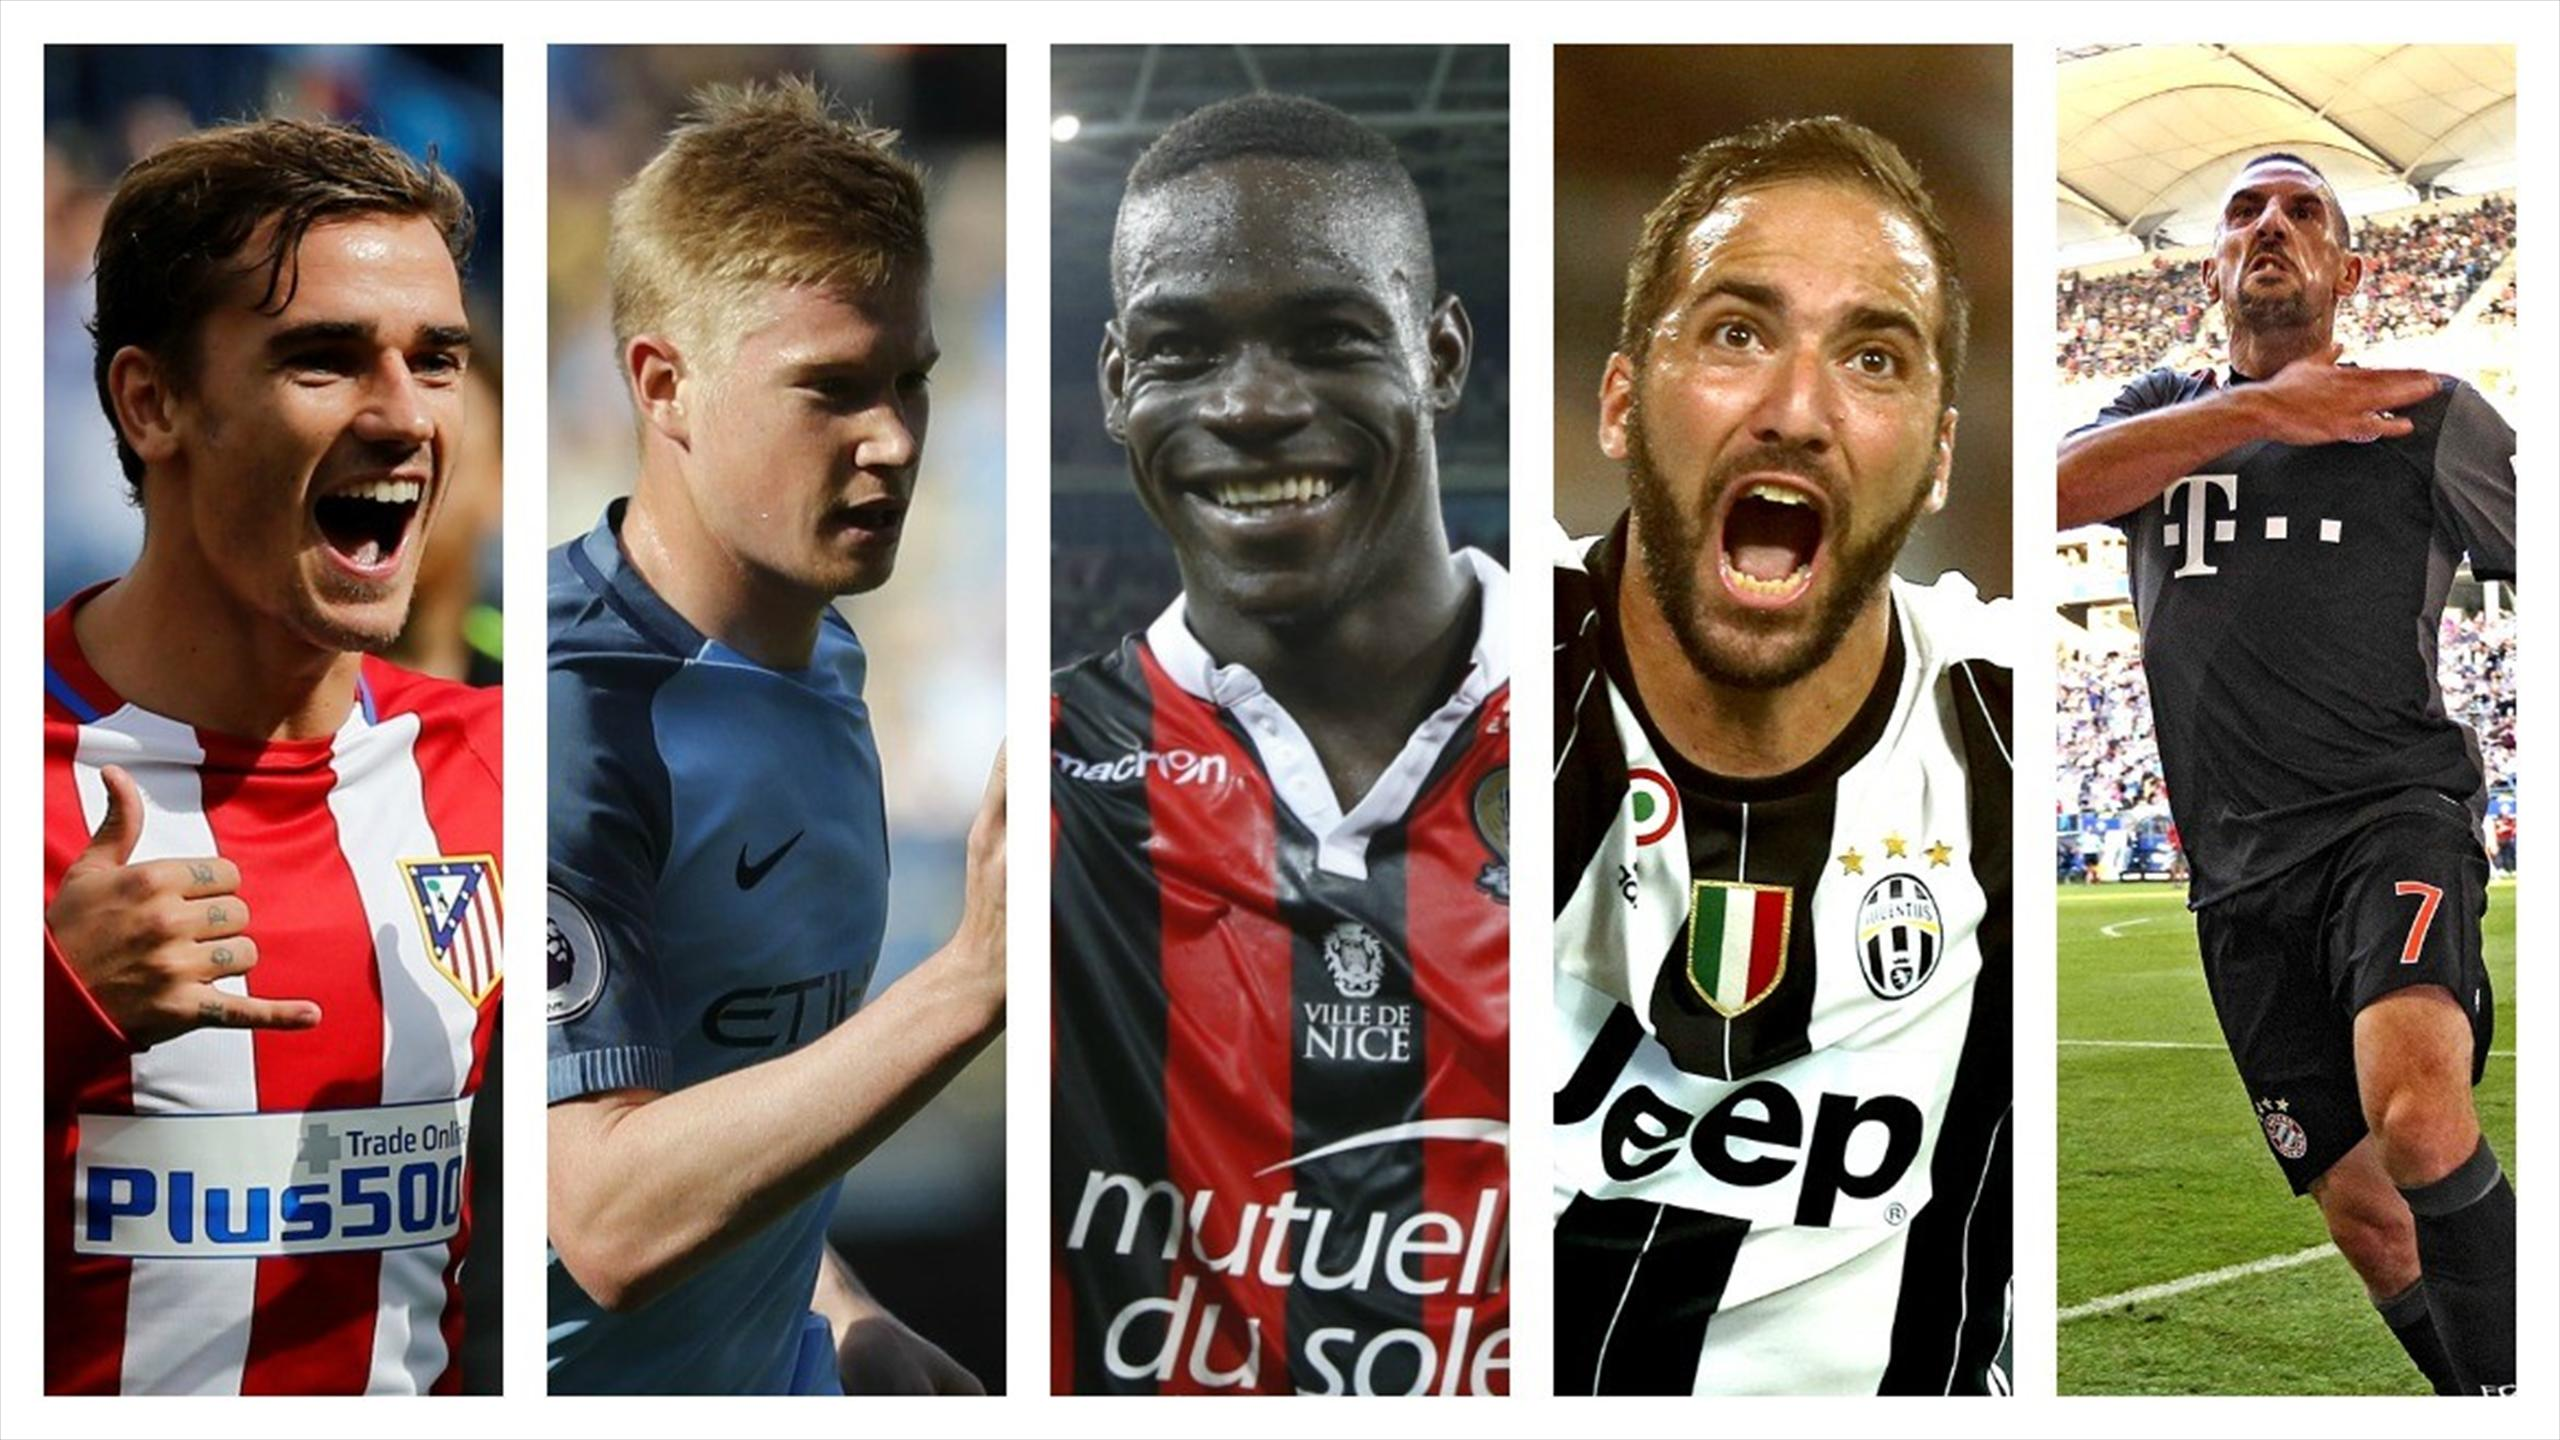 Antoine Griezmann, Kevin De Bruyne, Mario Balotelli, Gonzalo Higuain, Franck Ribery